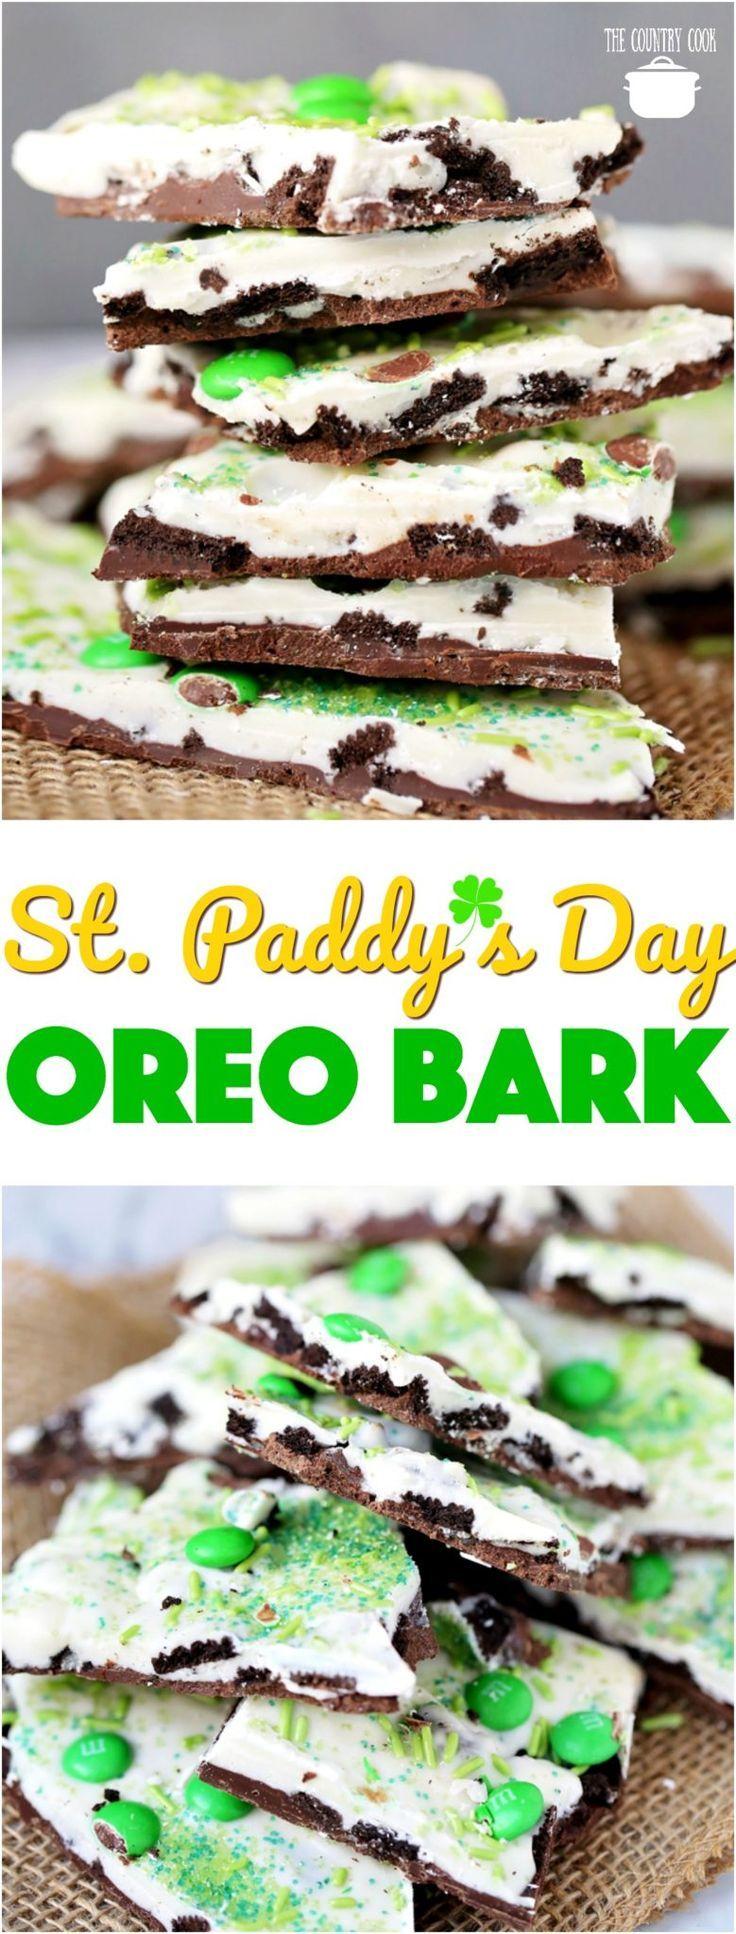 St. Patrick's Day No-Bake Oreo Bark recipe from The Country Cook #desserts #nobake #easy #recipes #ideas #StPatricksDay #kidfriendly #Oreos